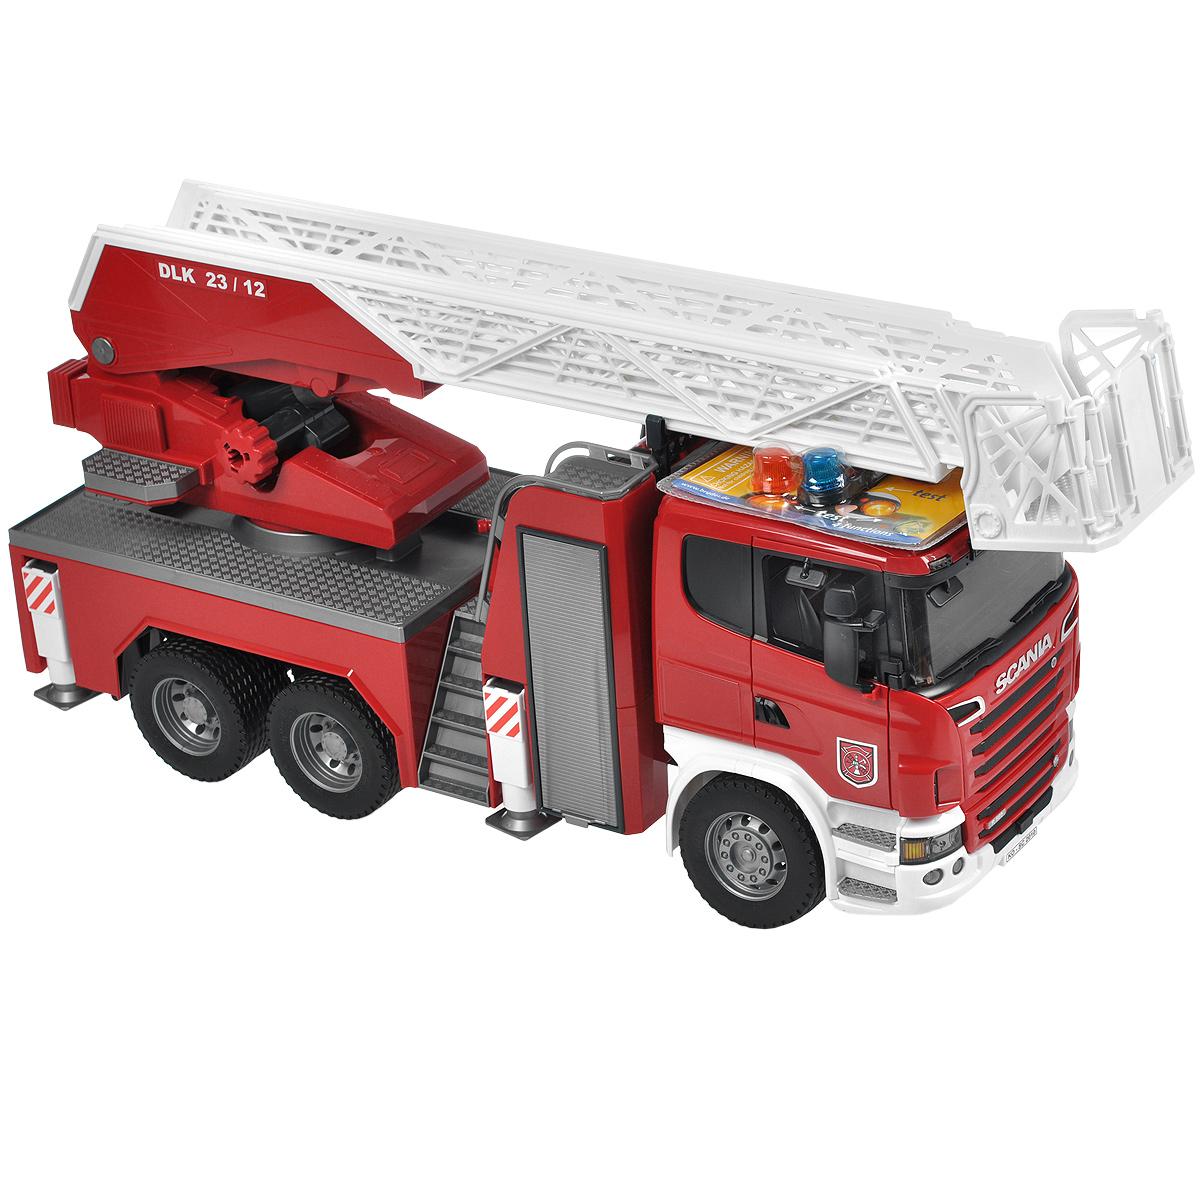 Bruder Пожарная машина Scania bruder пожарная машина scania с 3 лет